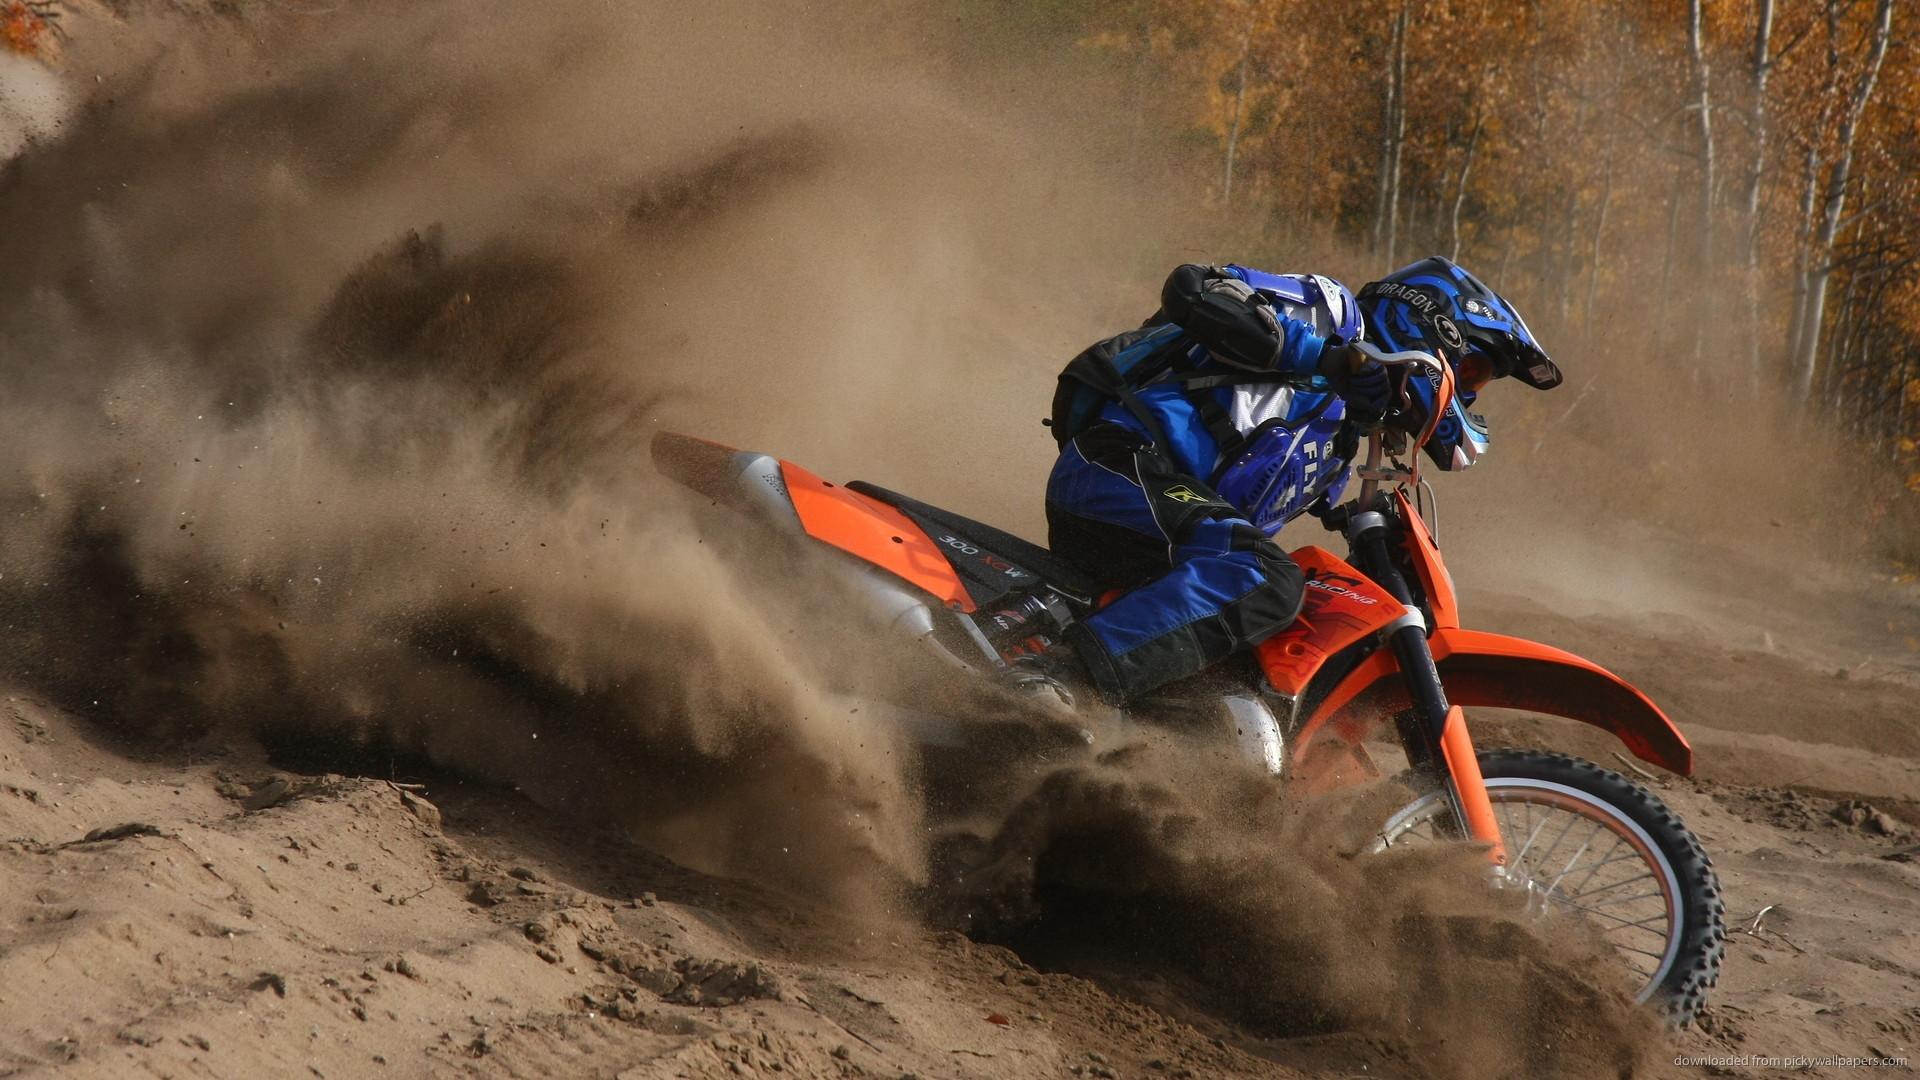 HD Off Road Dirt Motocross wallpaper